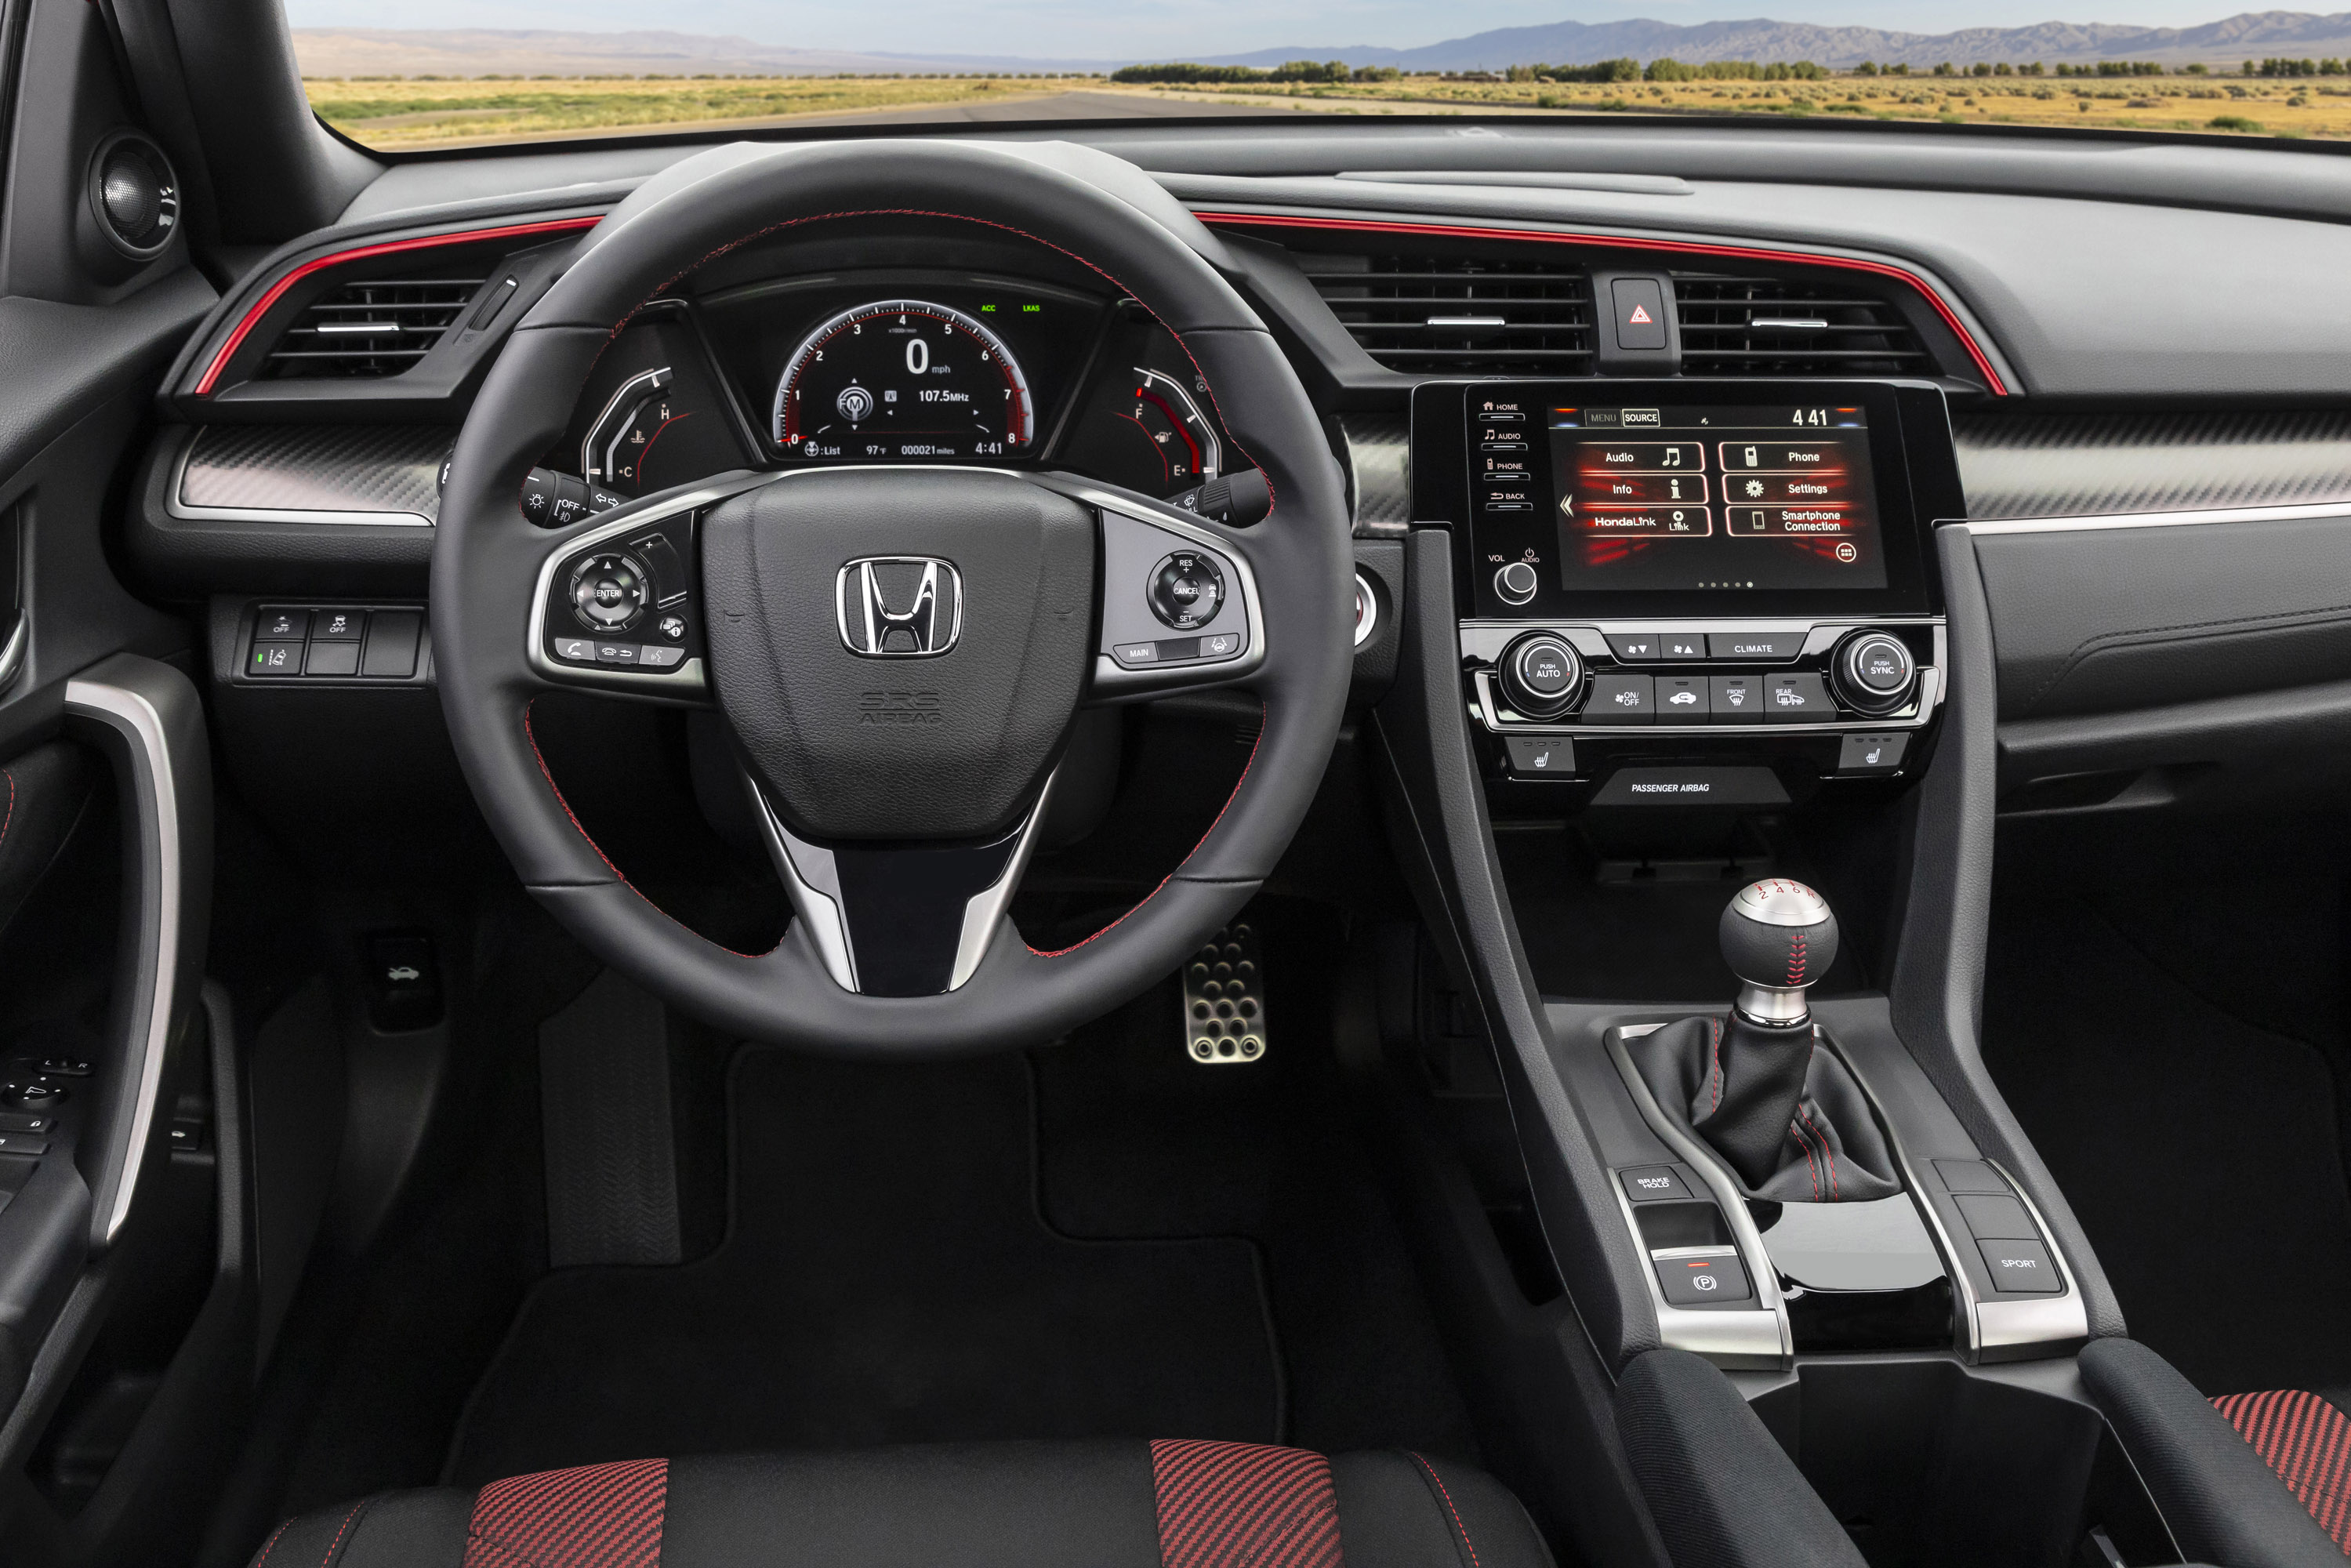 2012 Honda Civic For Sale >> Honda presents new Civic Si Sedan and Coupe models